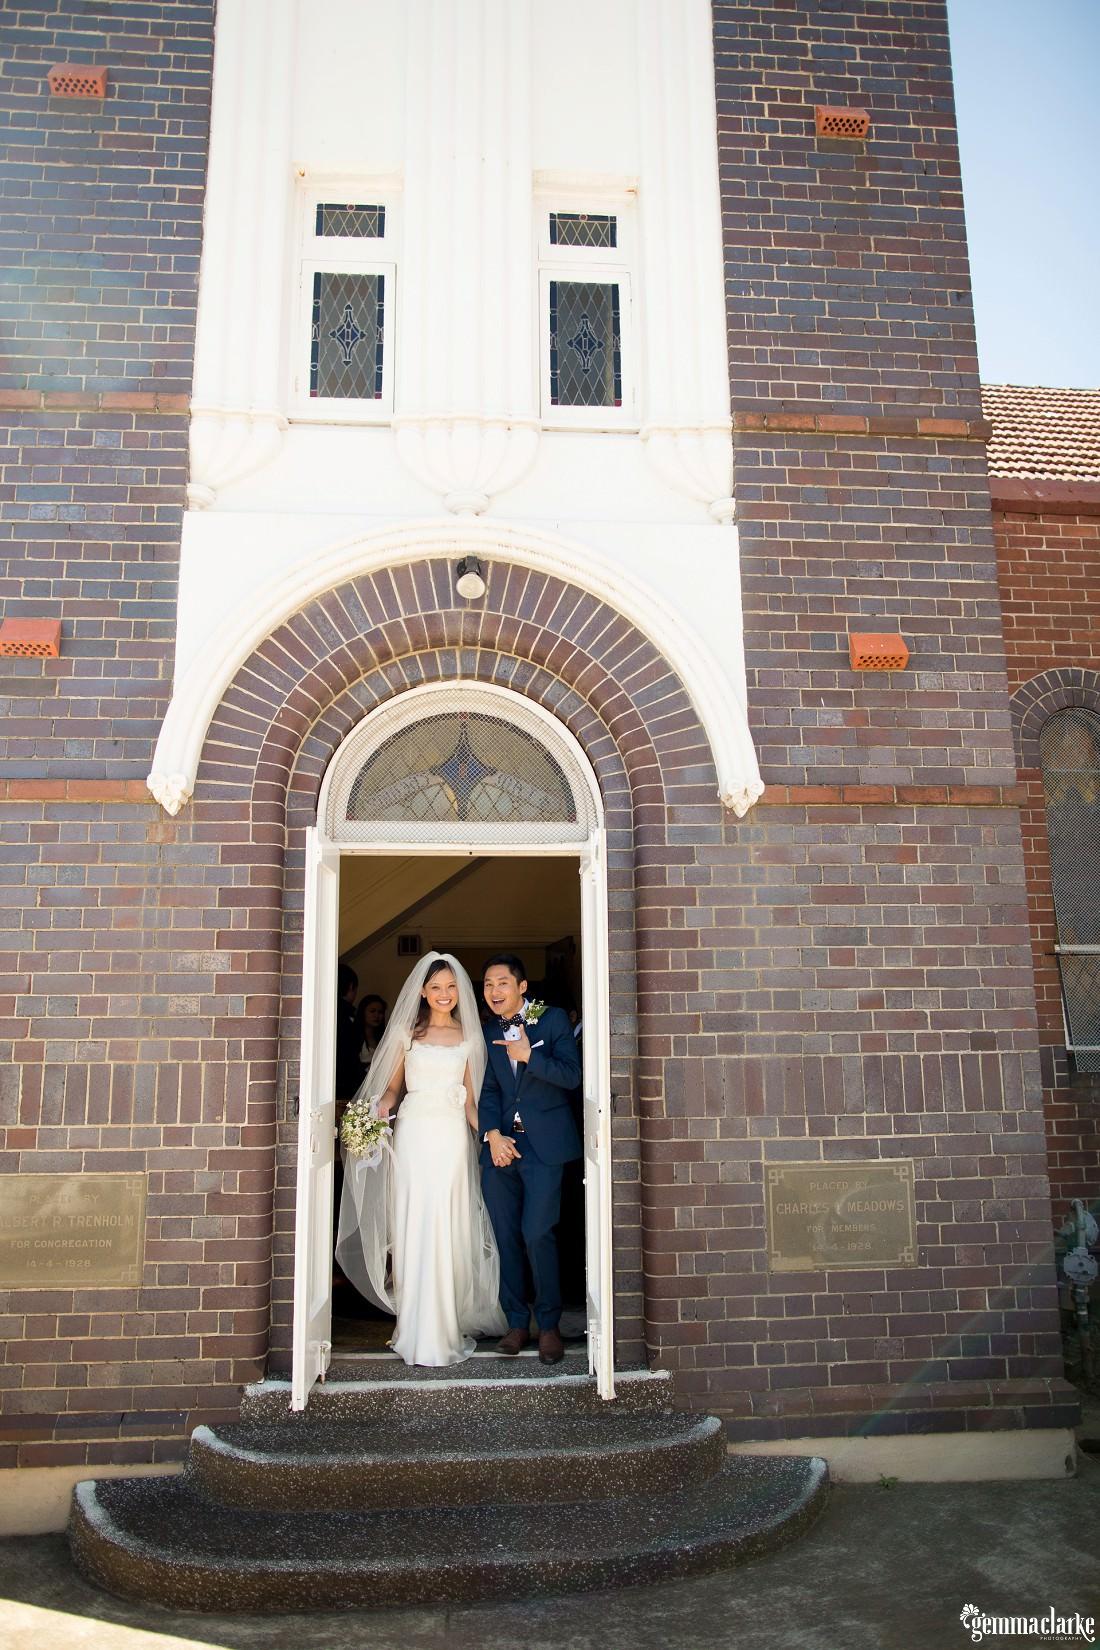 gemma-clarke-photography_parramatta-park-wedding-photos_old-government-house-reception_kamille-and-sam_0032